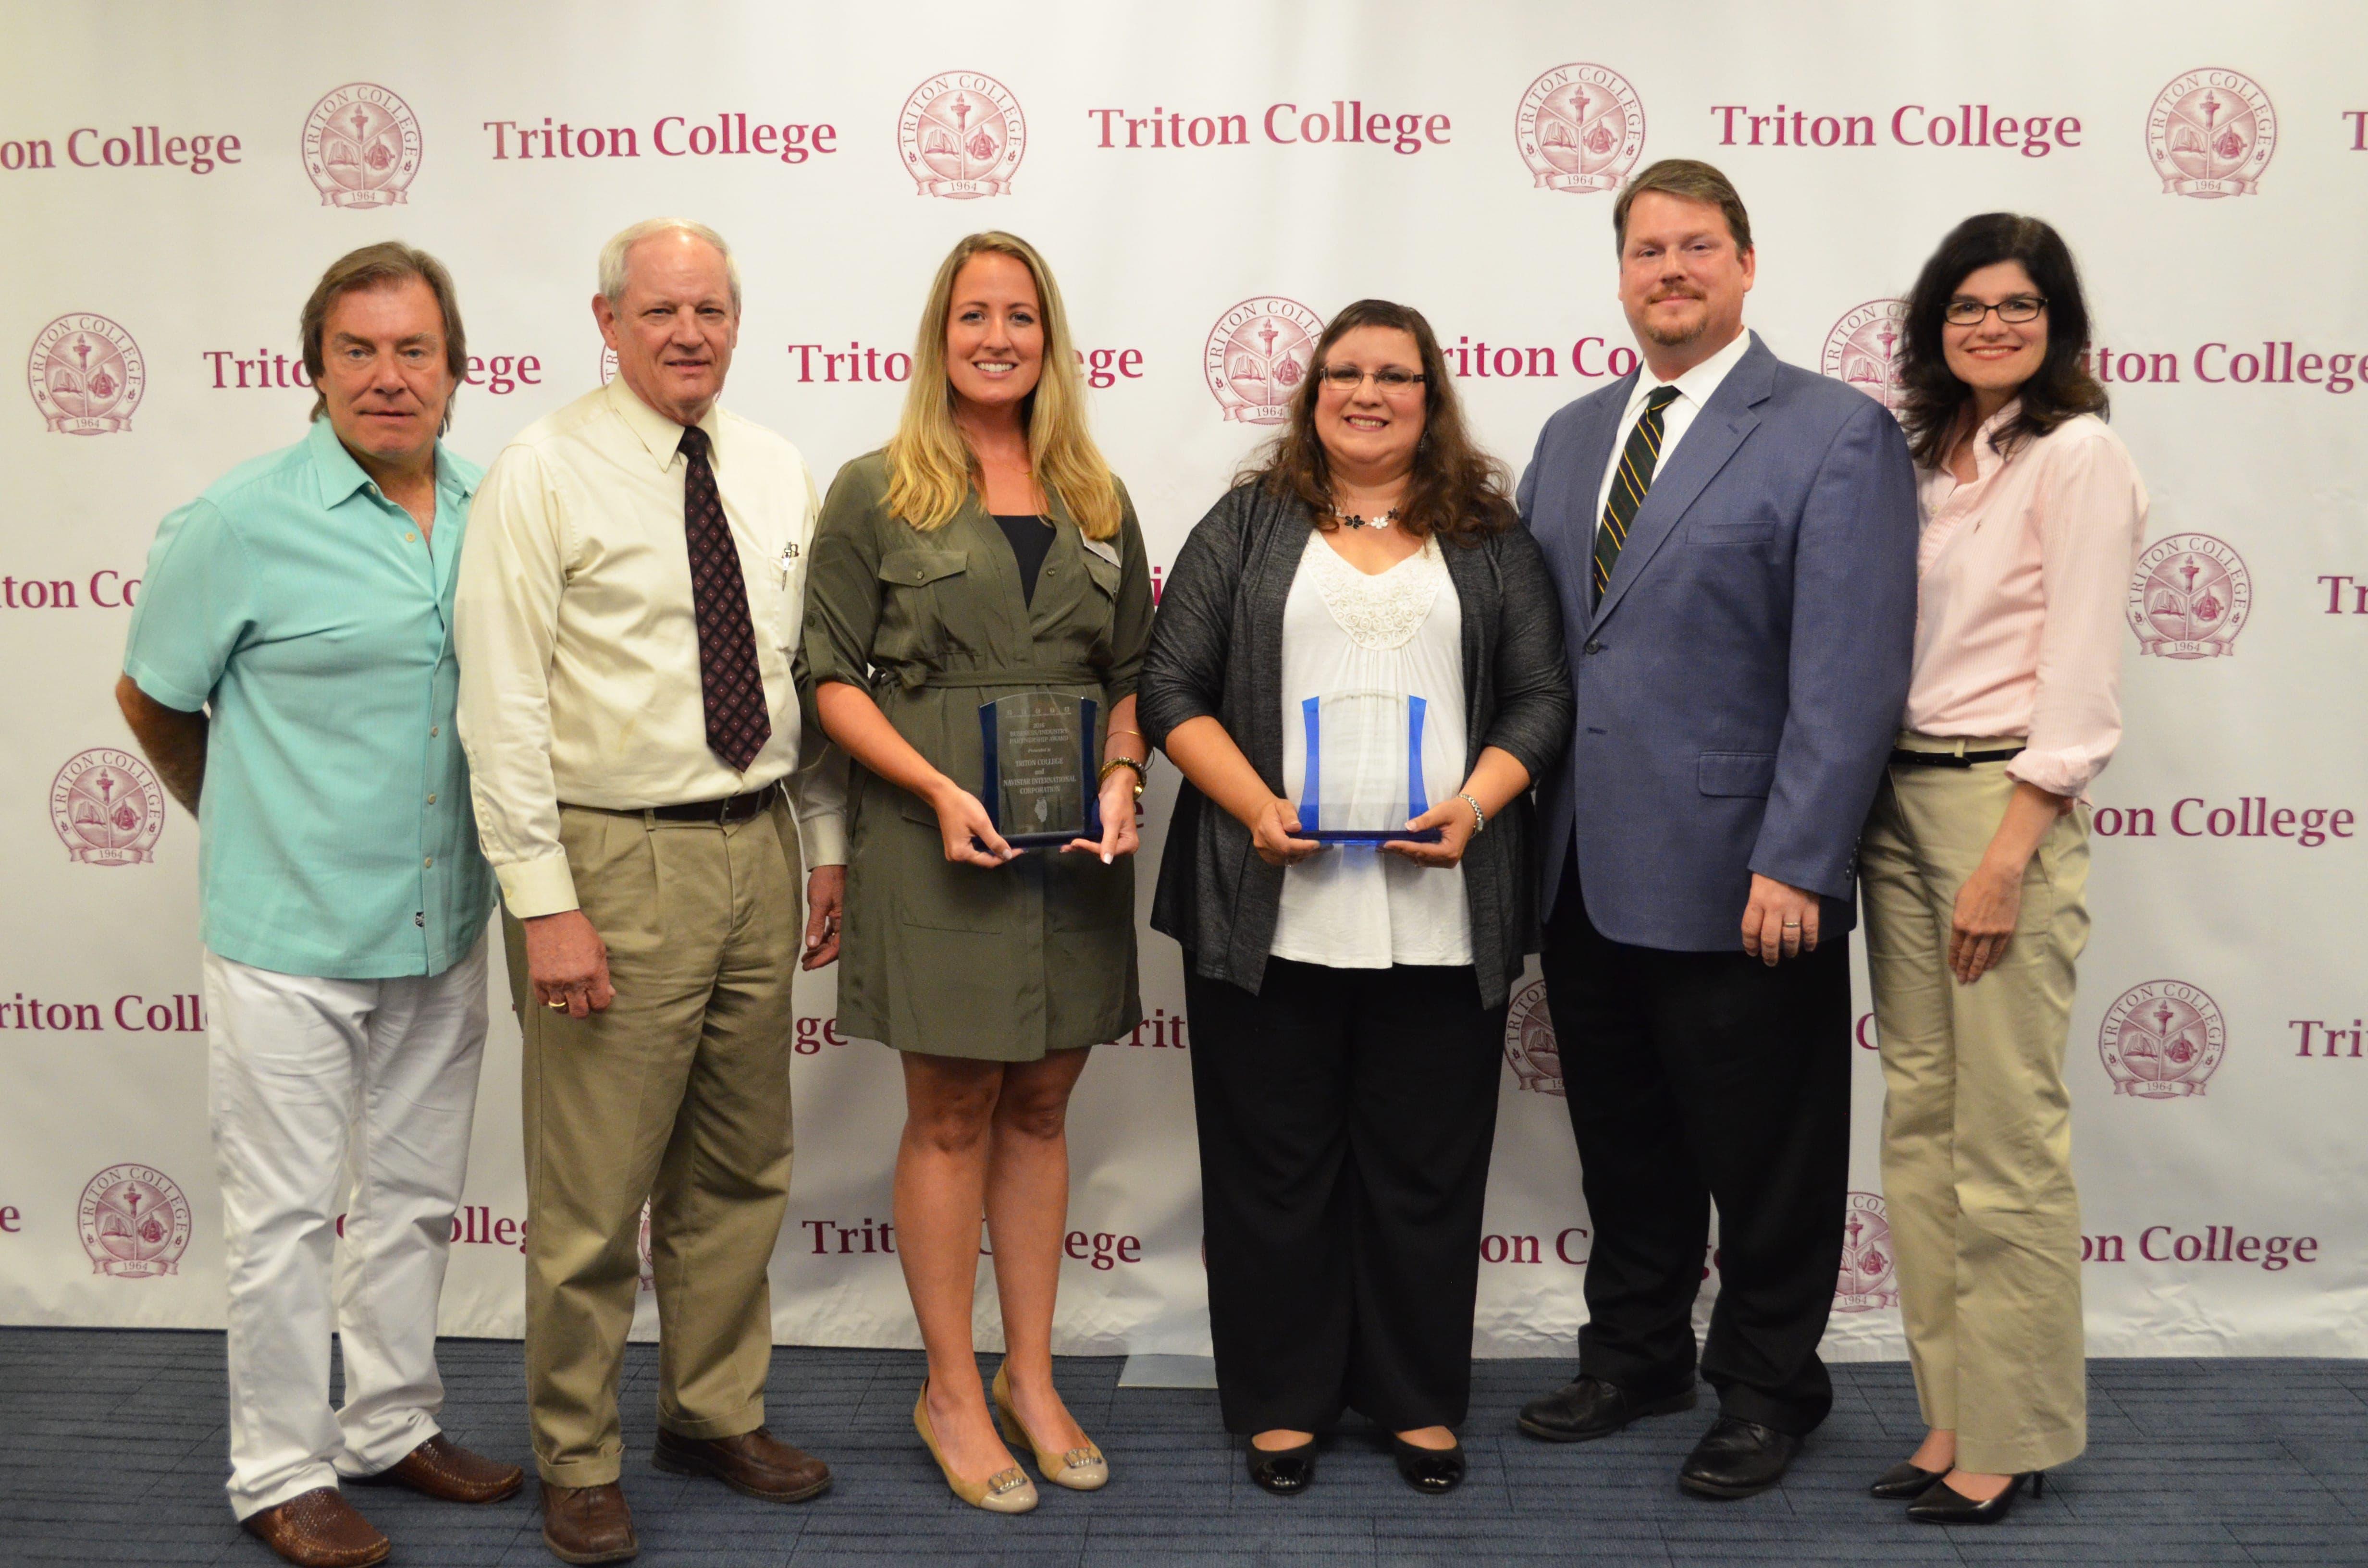 School of Continuing Education | Triton College